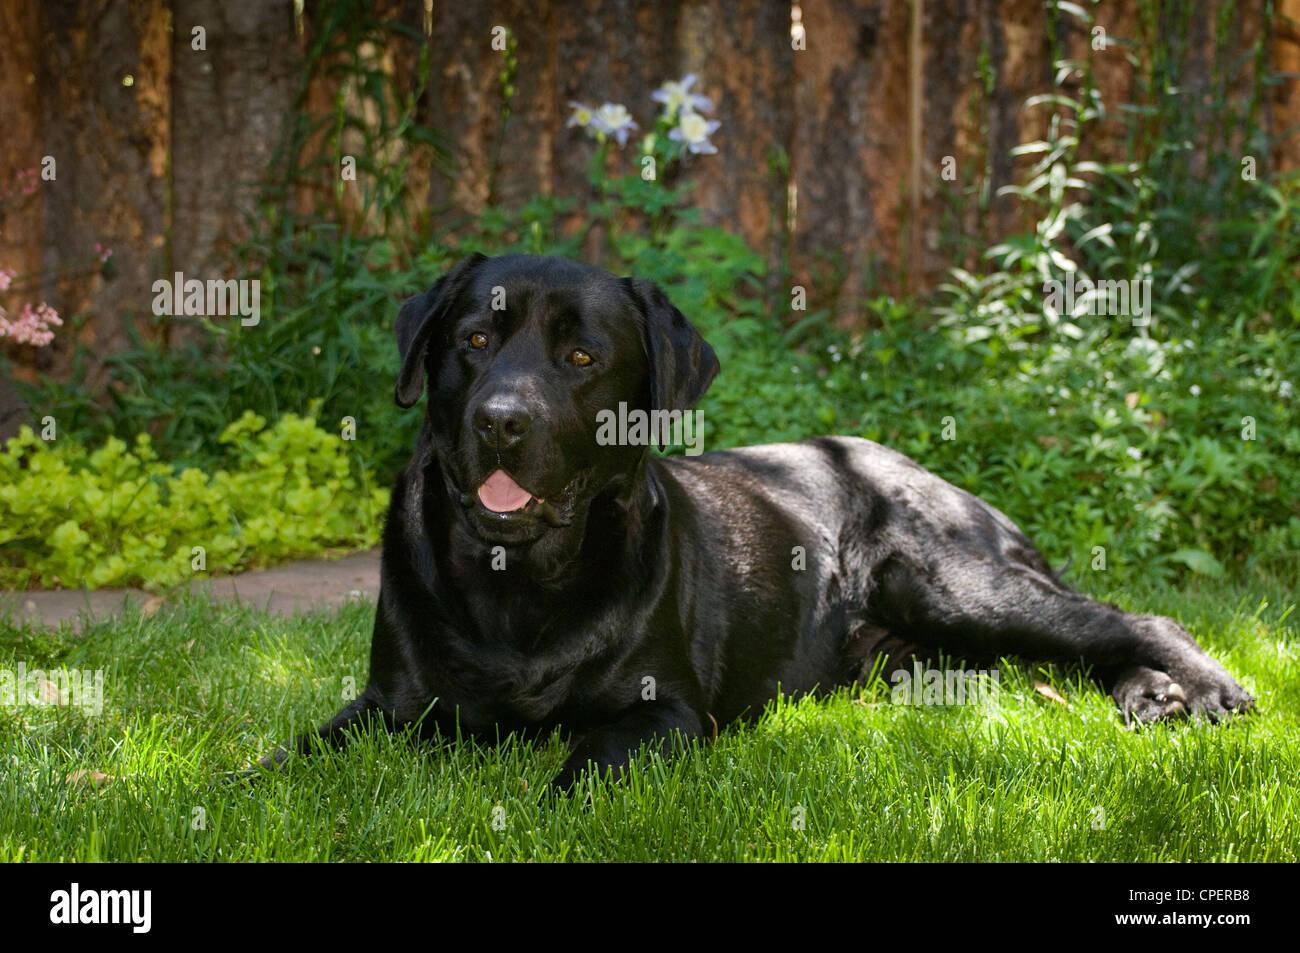 Black labrador retriever lying down - Stock Image